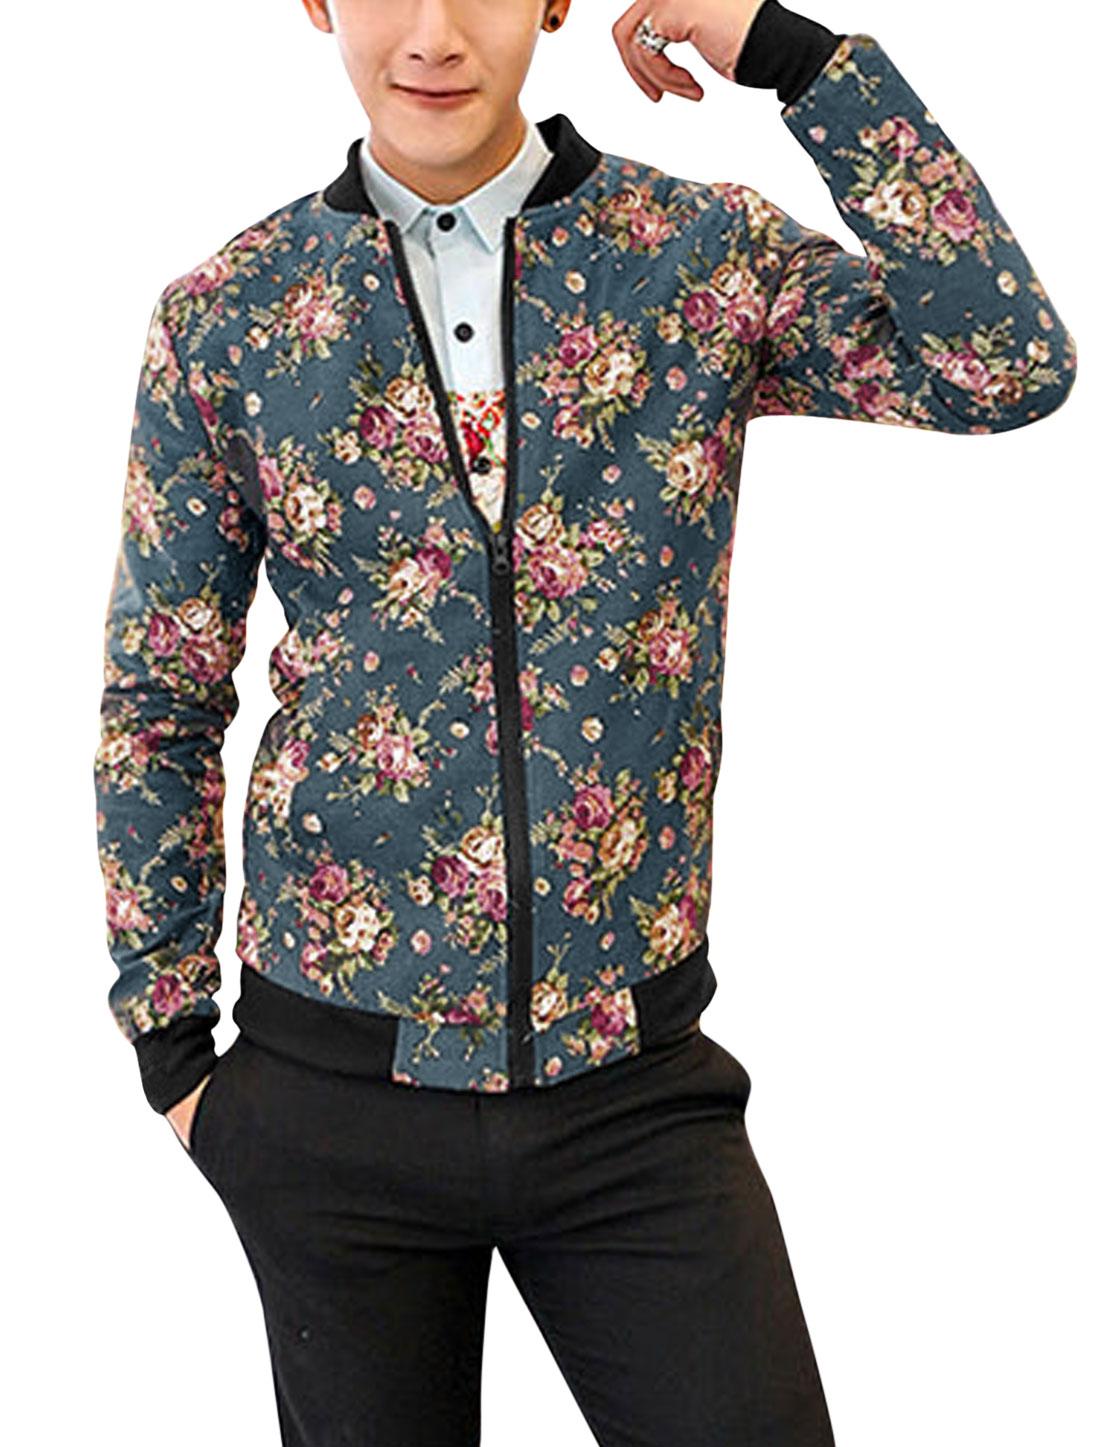 Men Fashion Style Floral Pattern Zip Up Light Jacket Steel Blue S